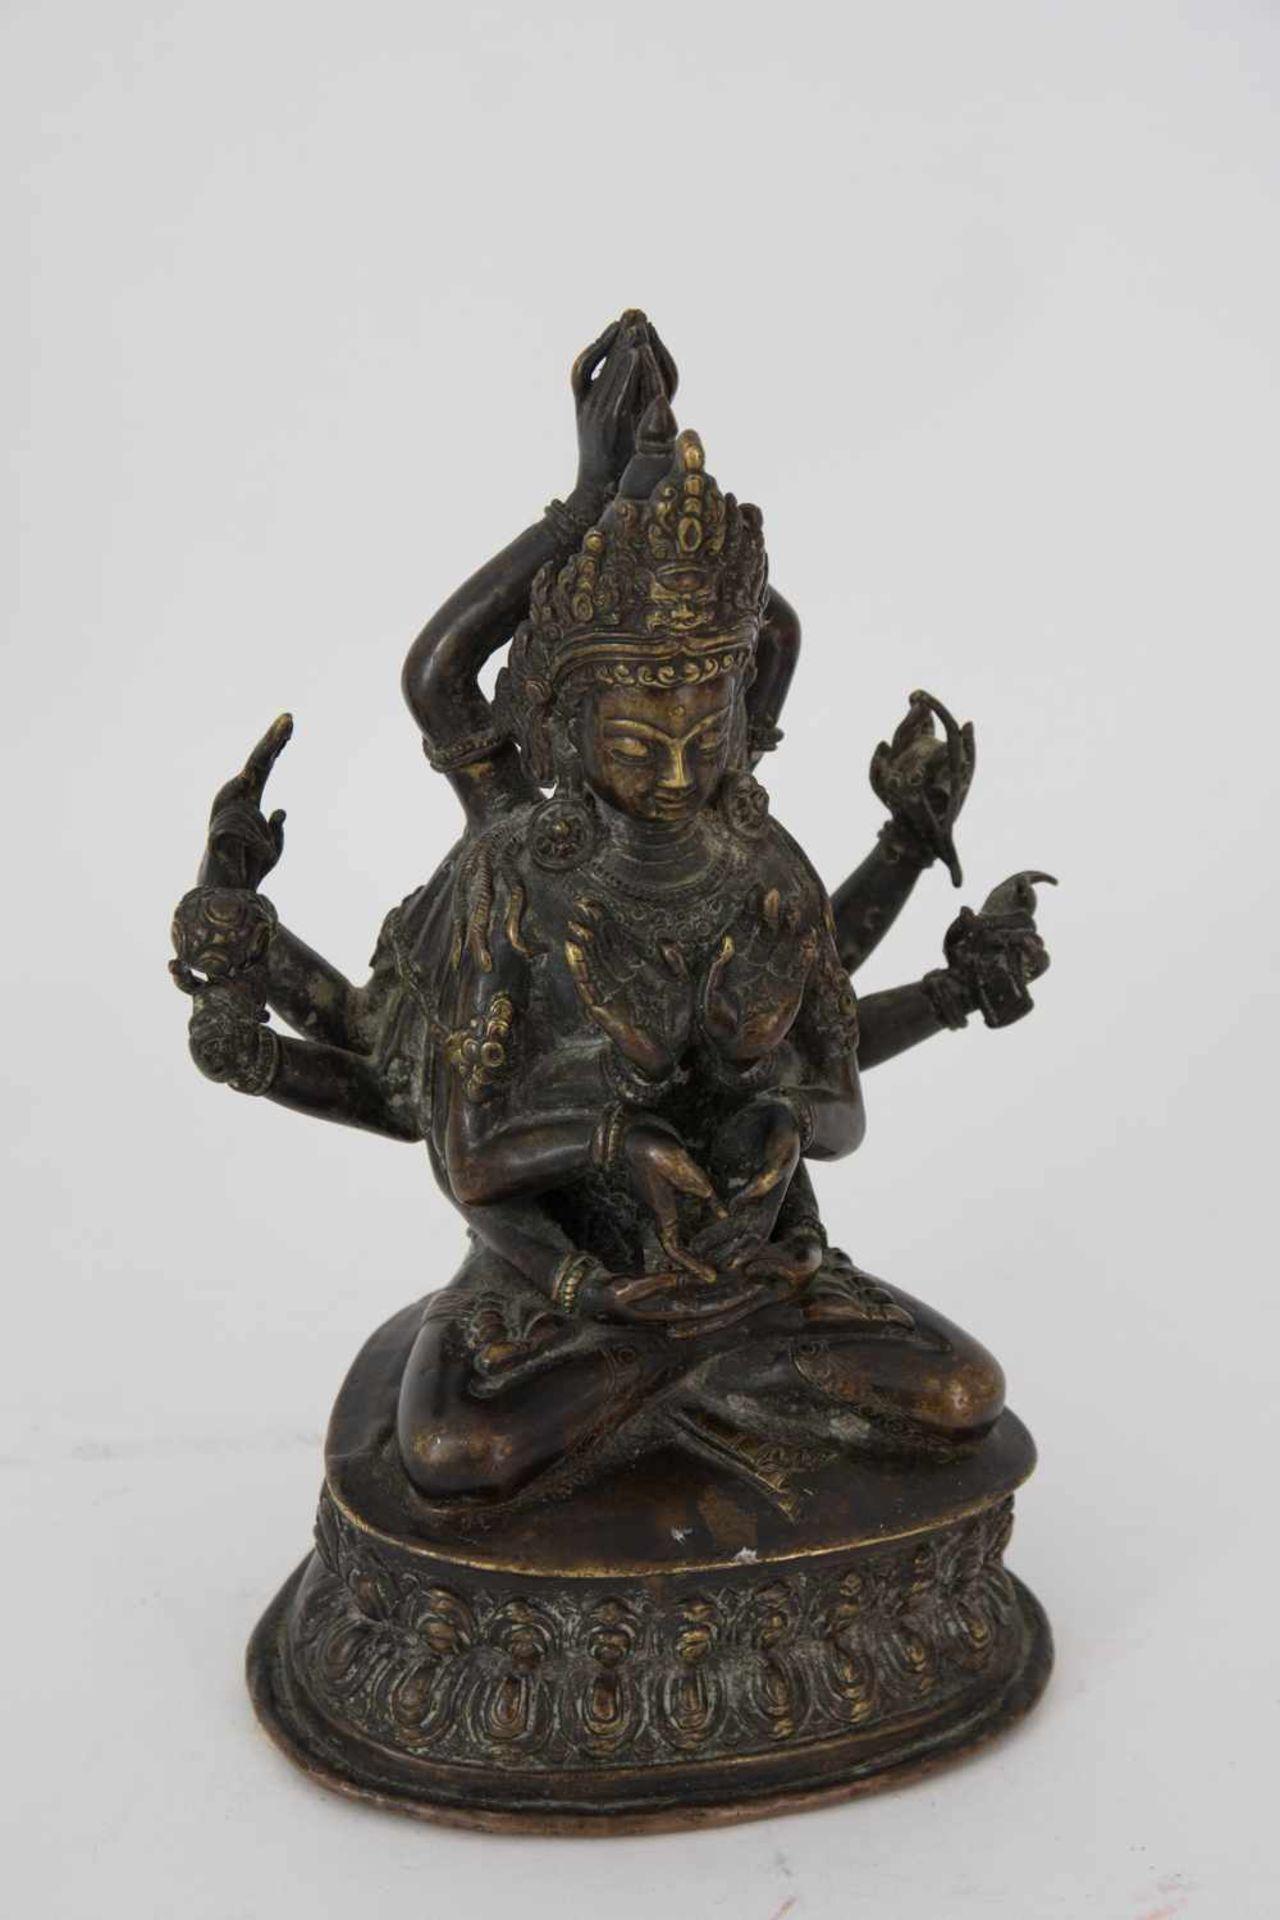 Los 14 - AVALOKITESVARA BODHISATTVA FIGURE, bronze, eastern Asia. A bronze Avalokitesvara Bodhisattva figure,